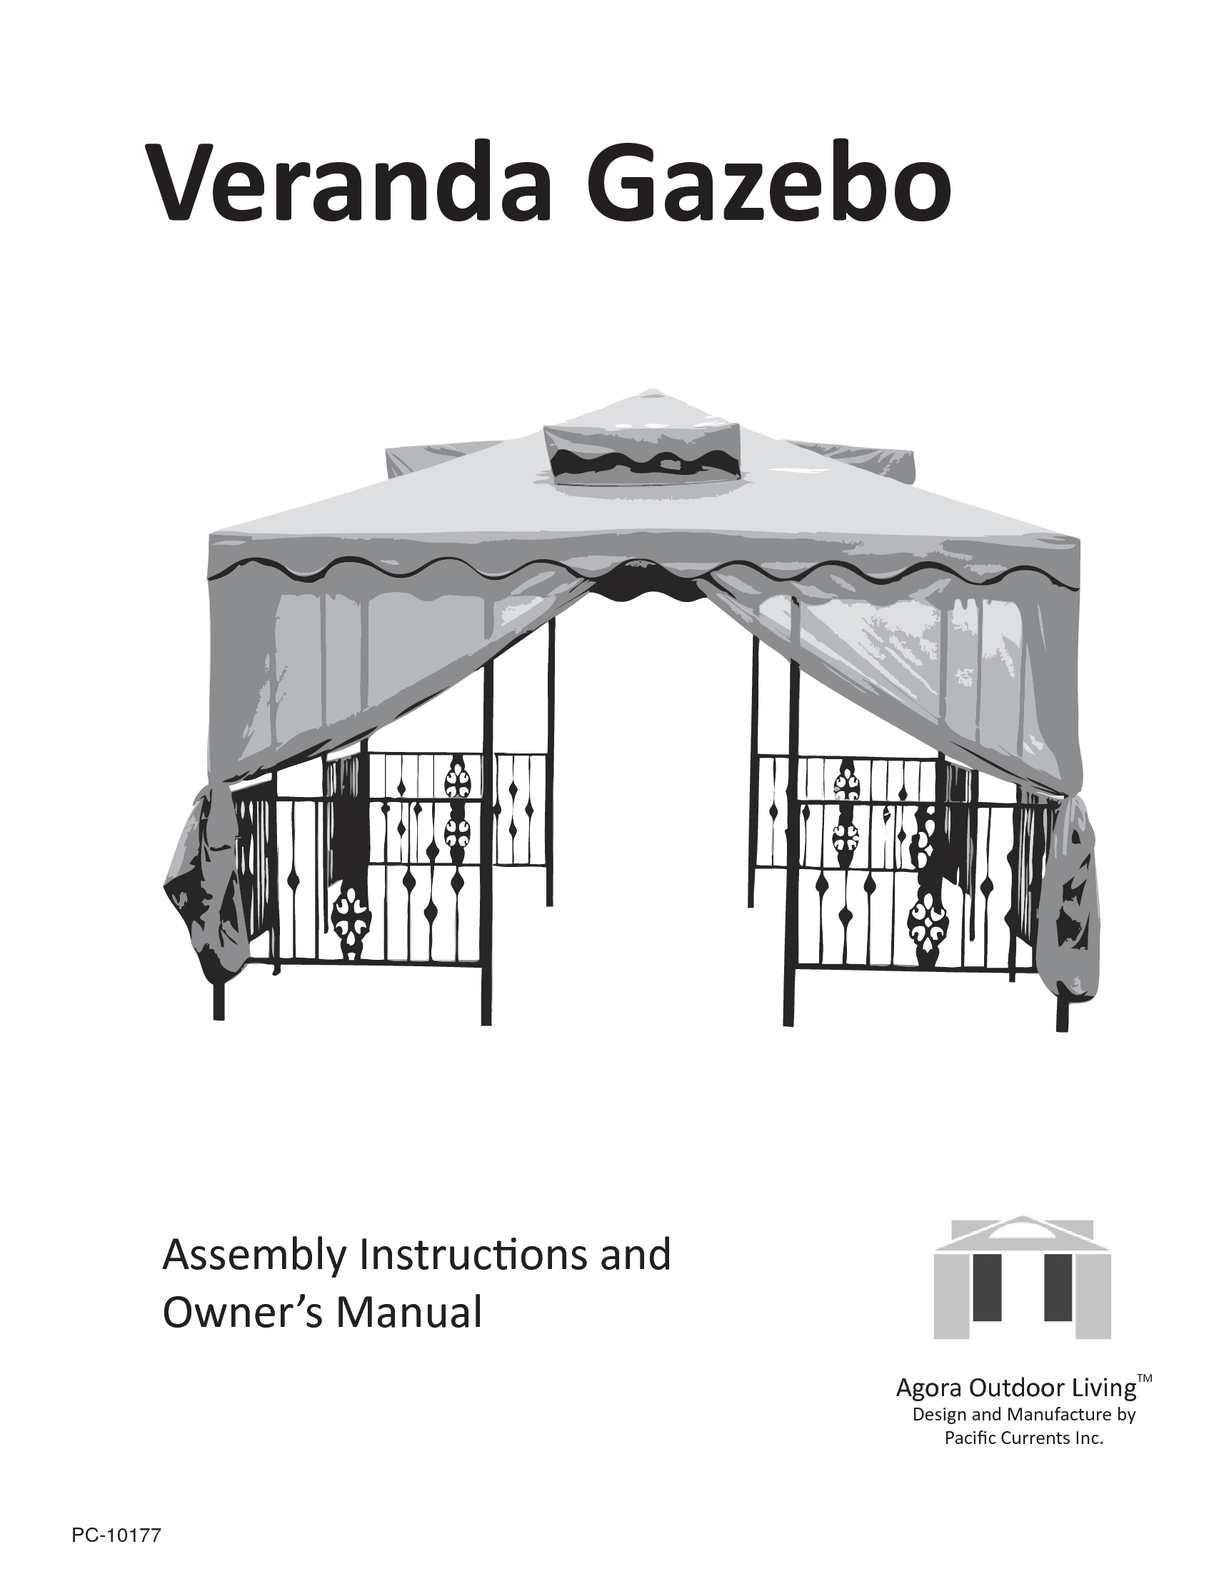 Calamo Veranda Gazebo Assembly Manual